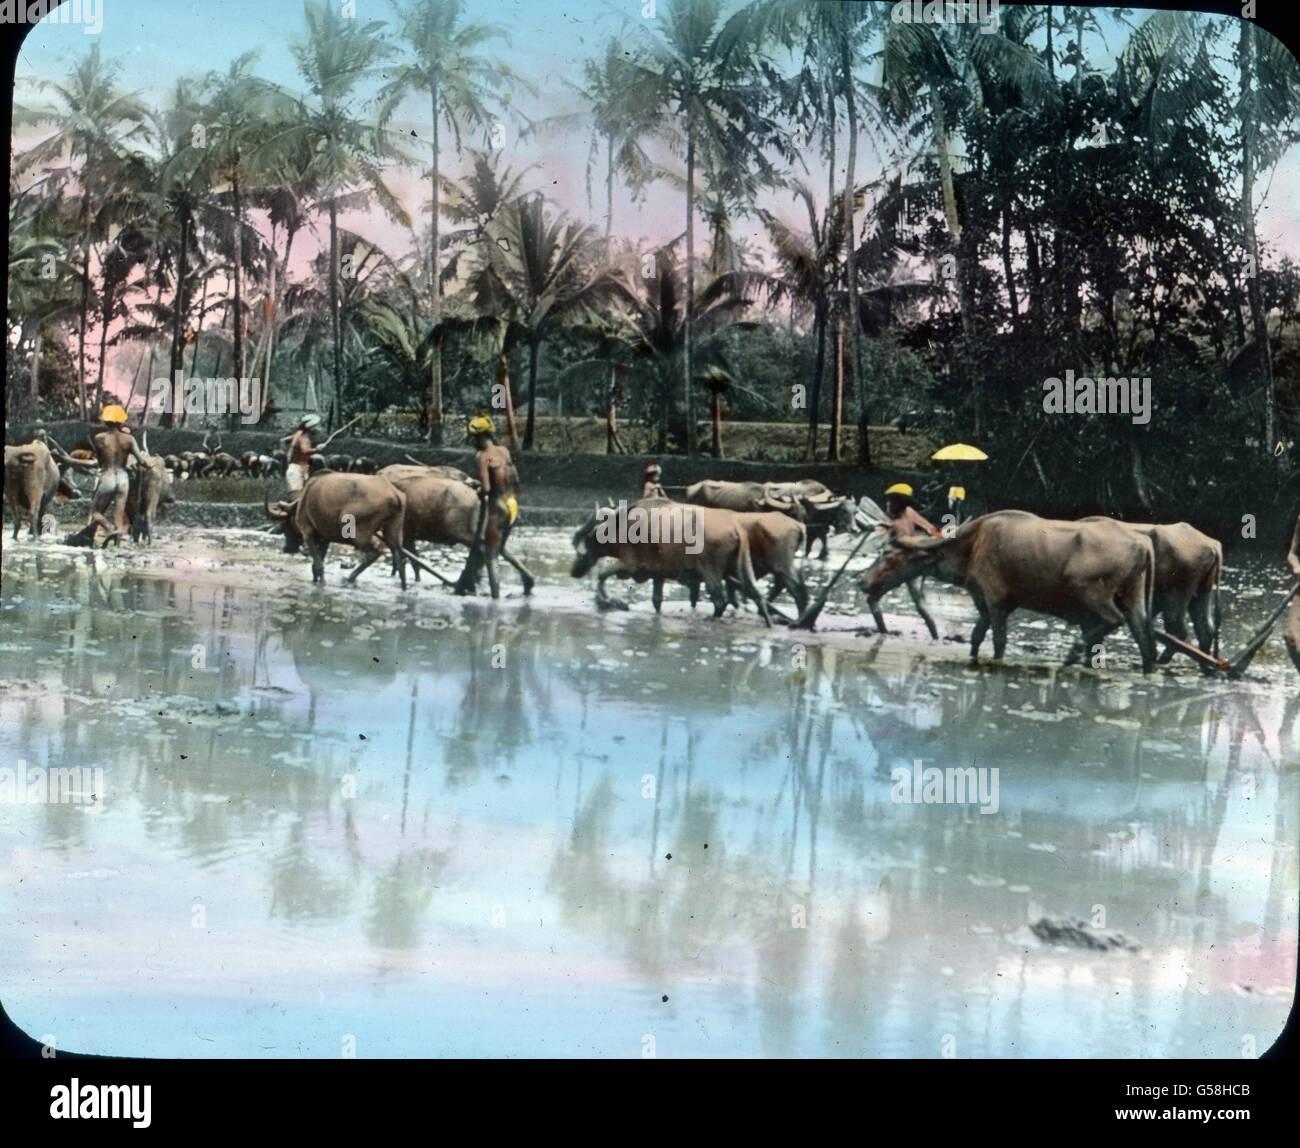 Bauern pflanzen Reis als Ernährungsgrundlage an. India, Asia, travel, farmer, rice, food, ploughing, ox, 1910s, - Stock Image